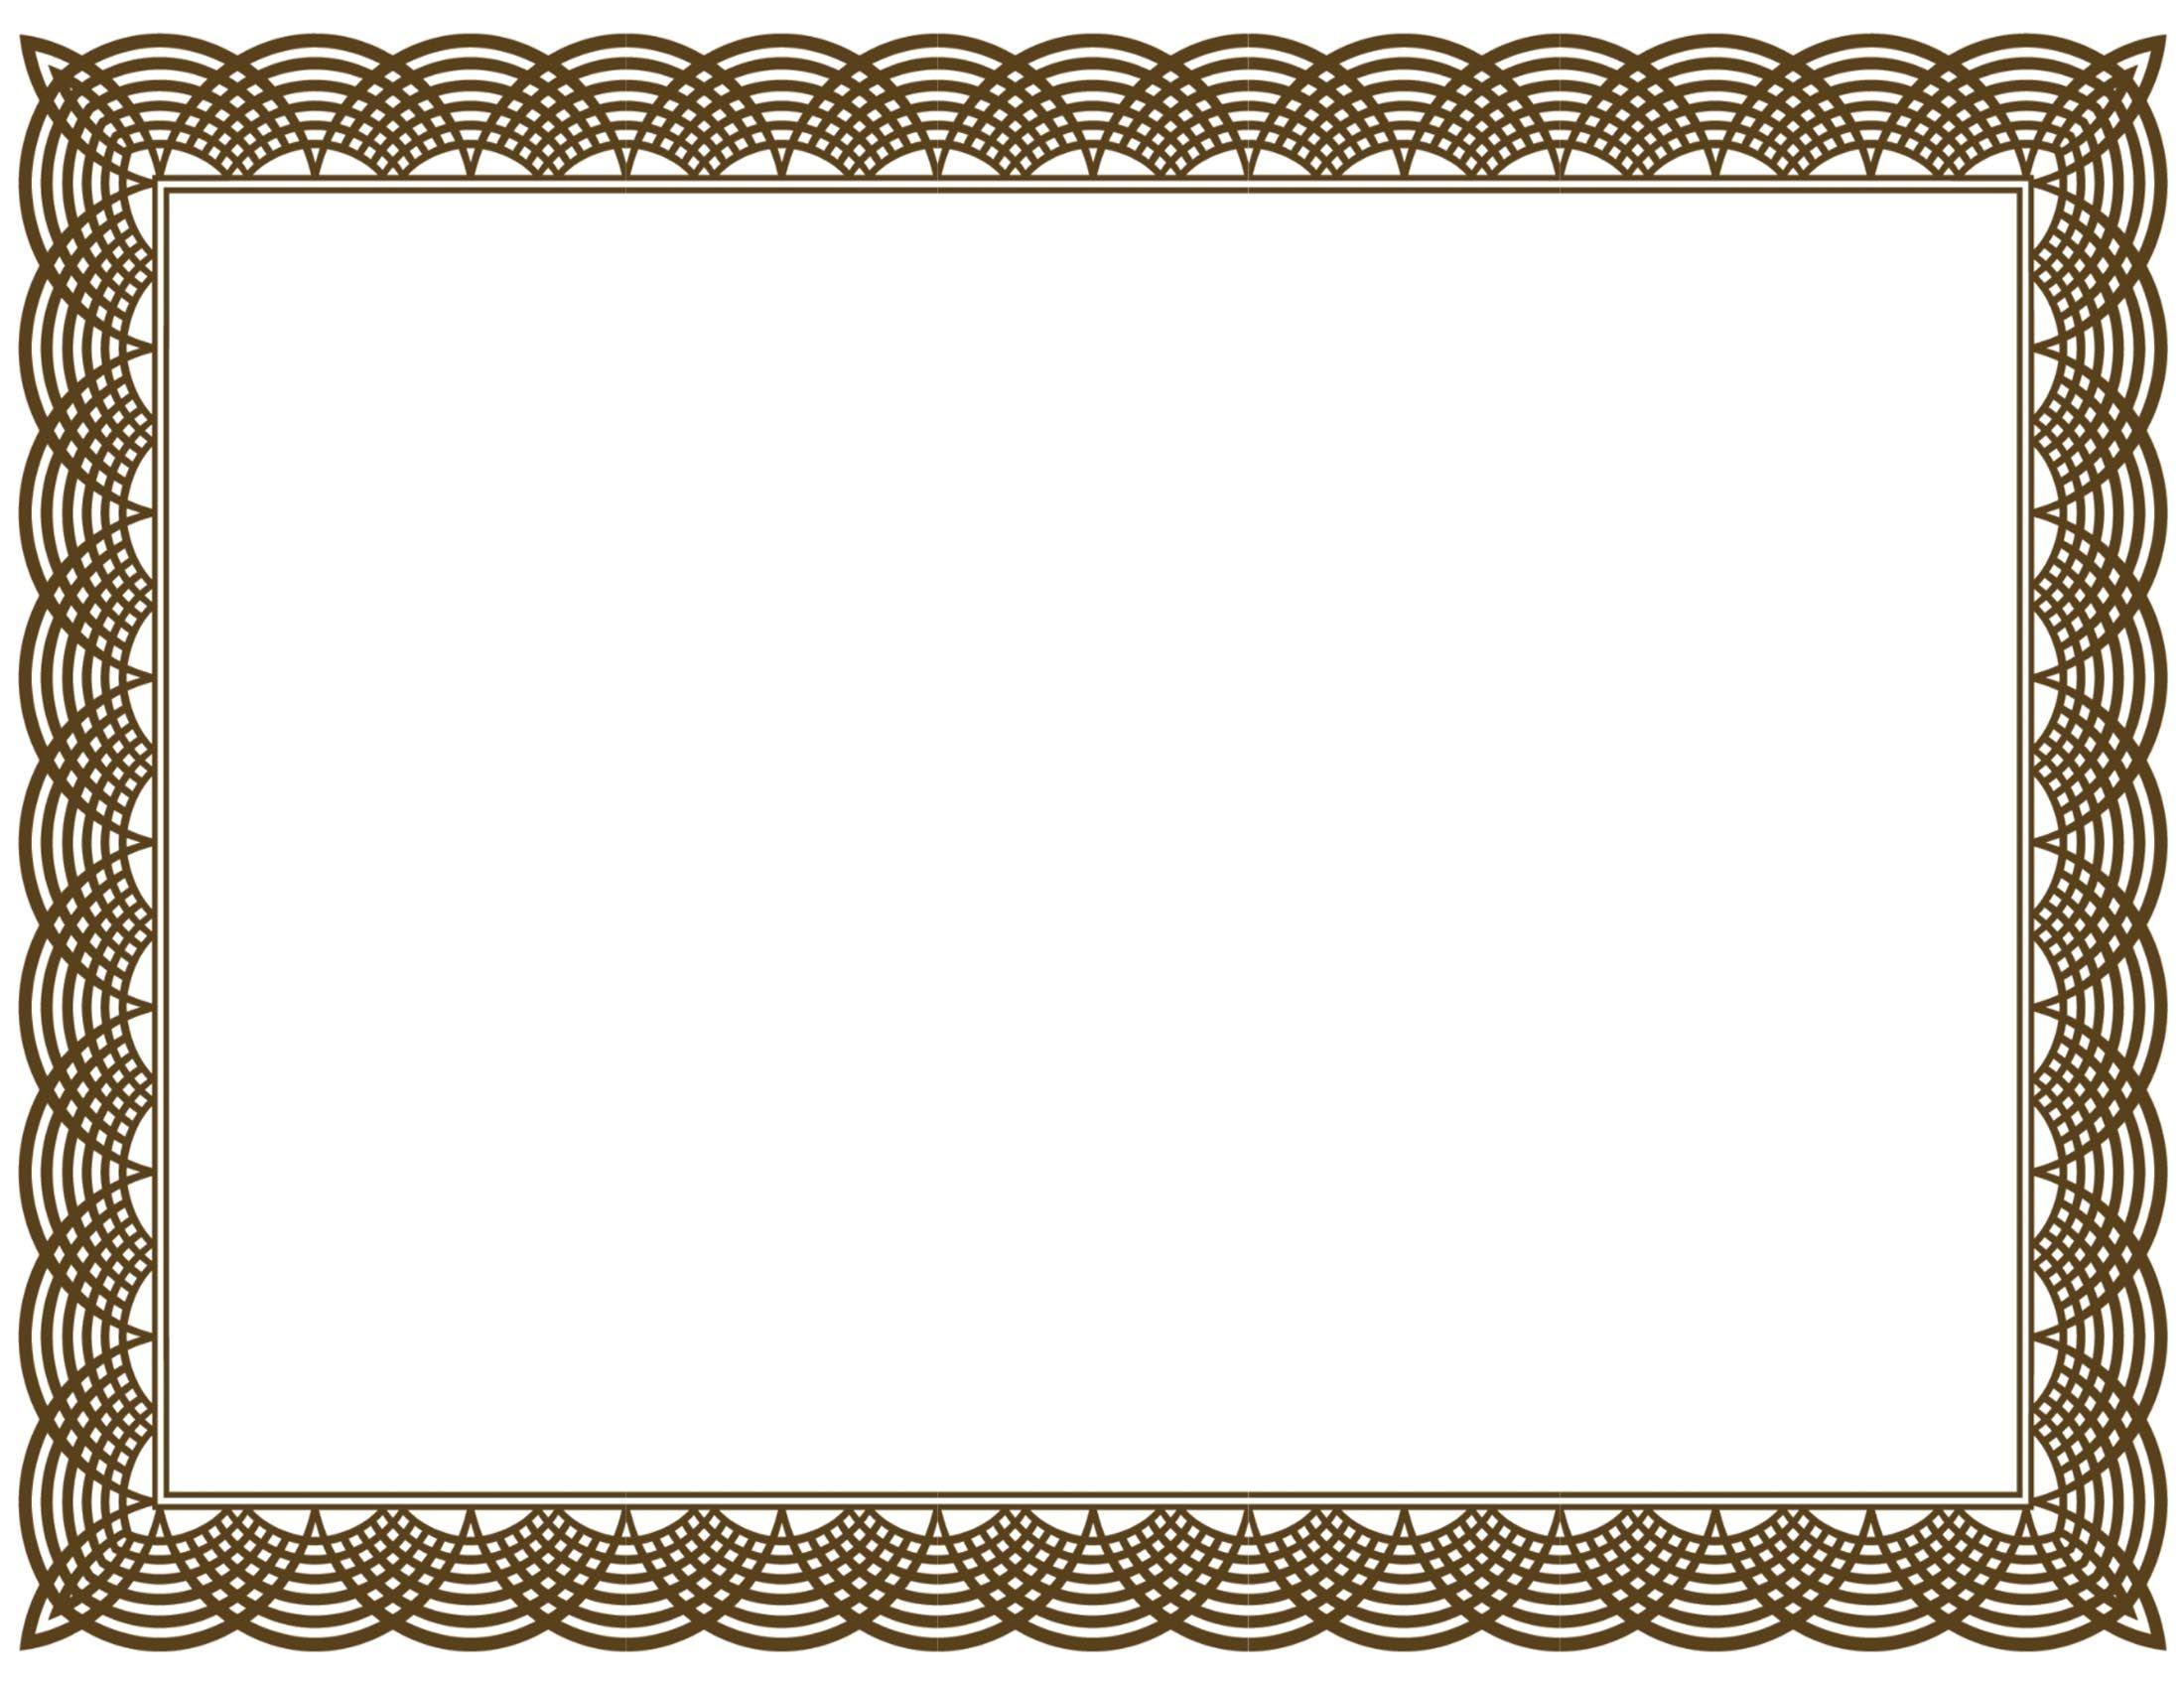 Bingkai Free printable blank certificate borders